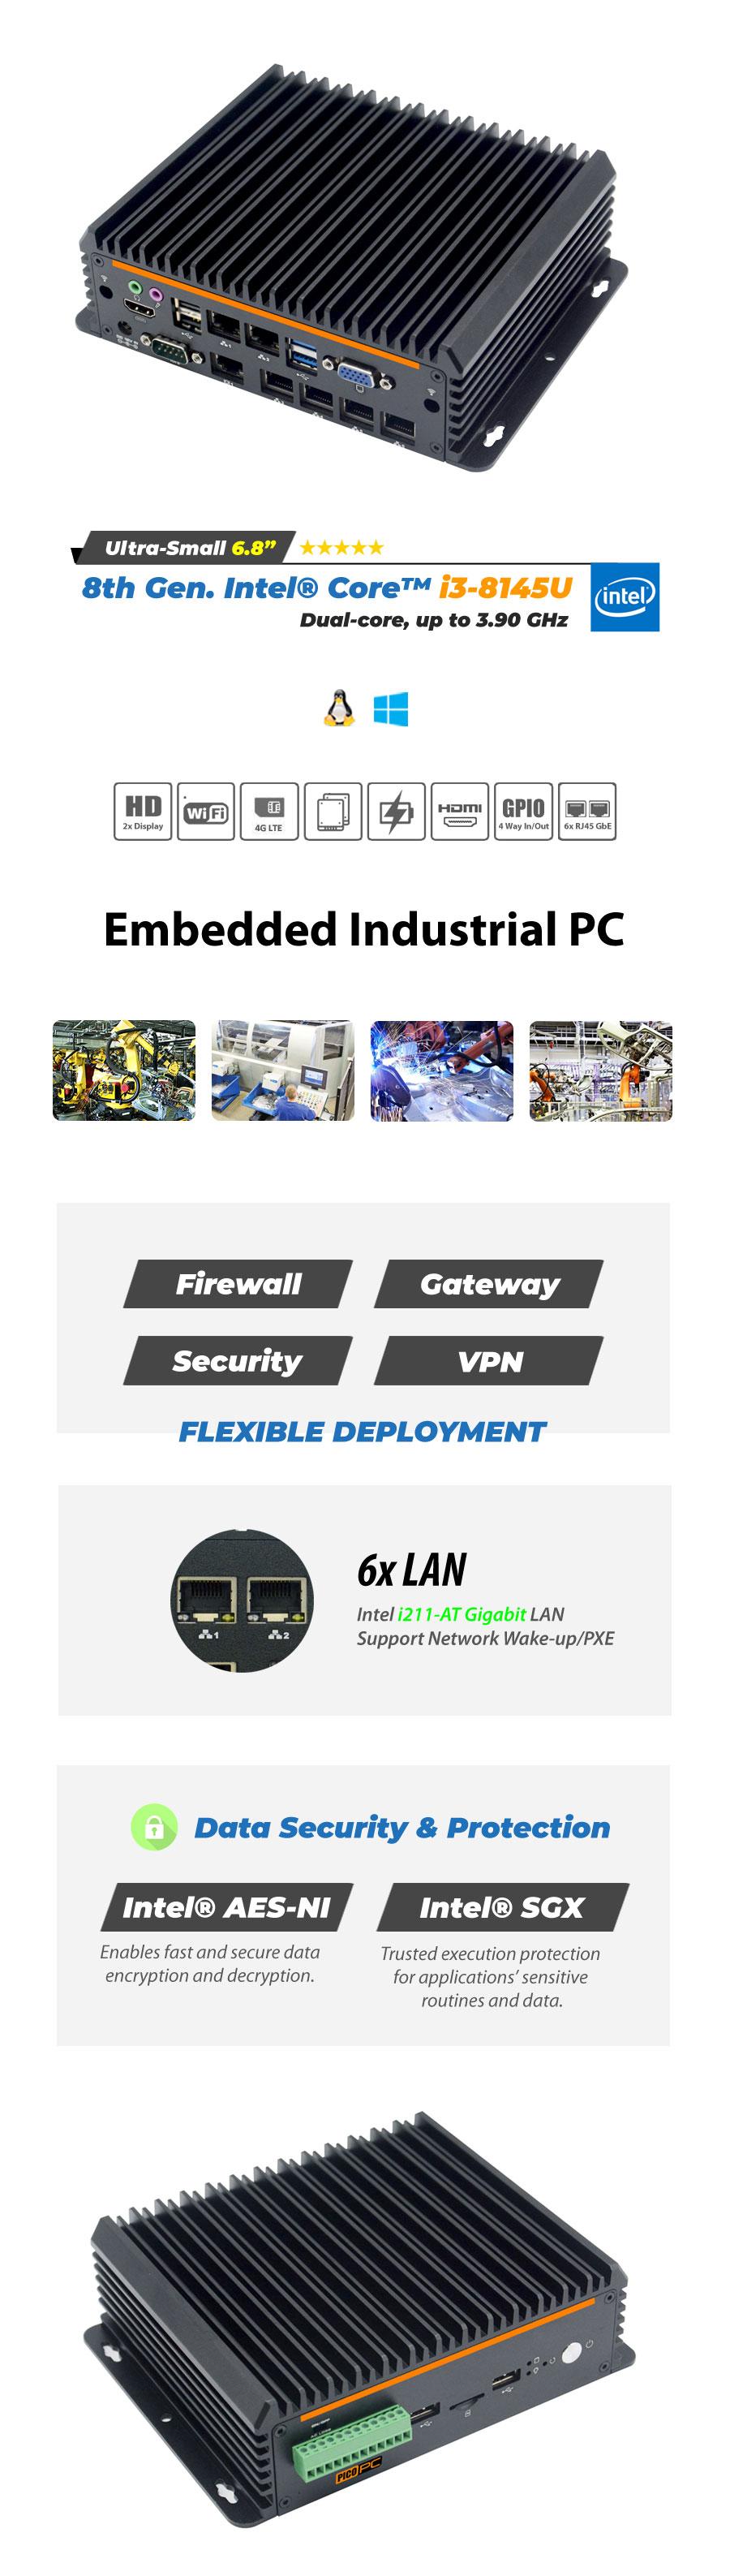 7th Gen Intel® i7-7700T 2 LAN ASRock HD Slim Fanless Mini PC - MNHO-086 | Image